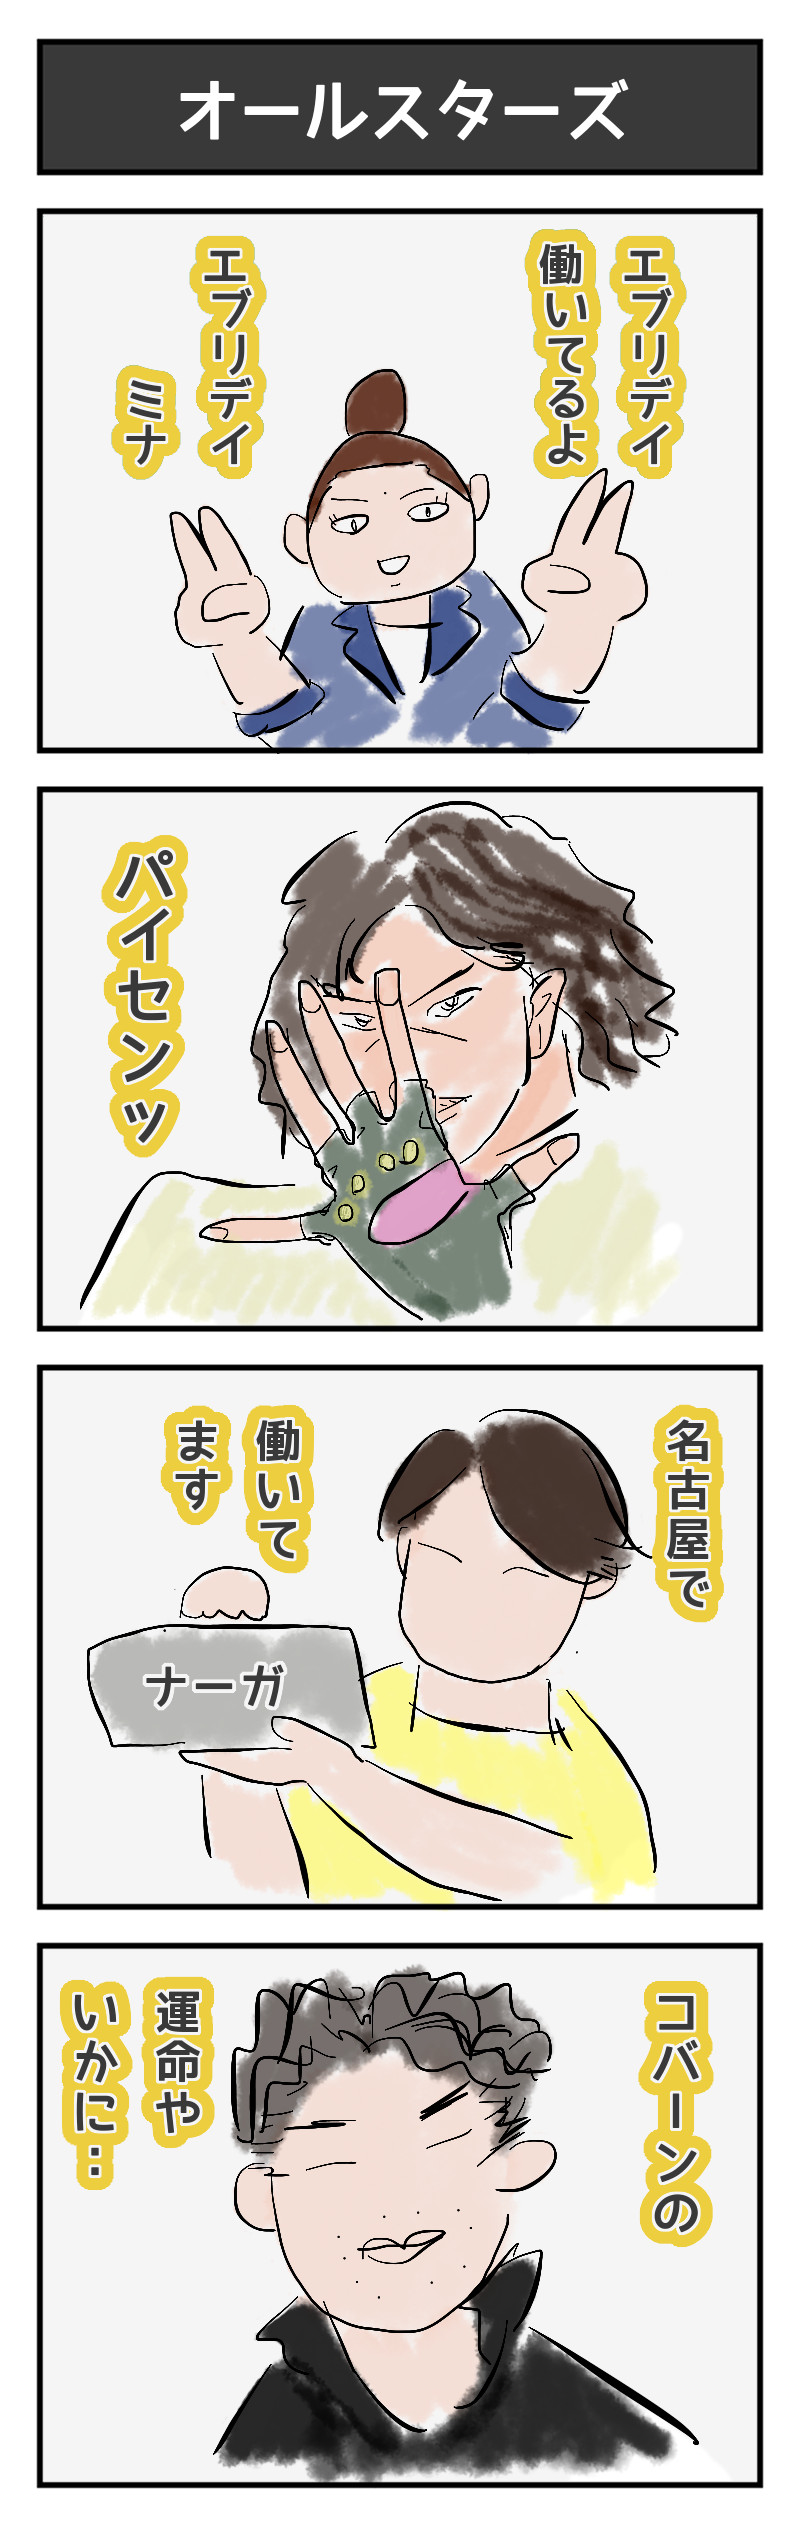 【100】-1